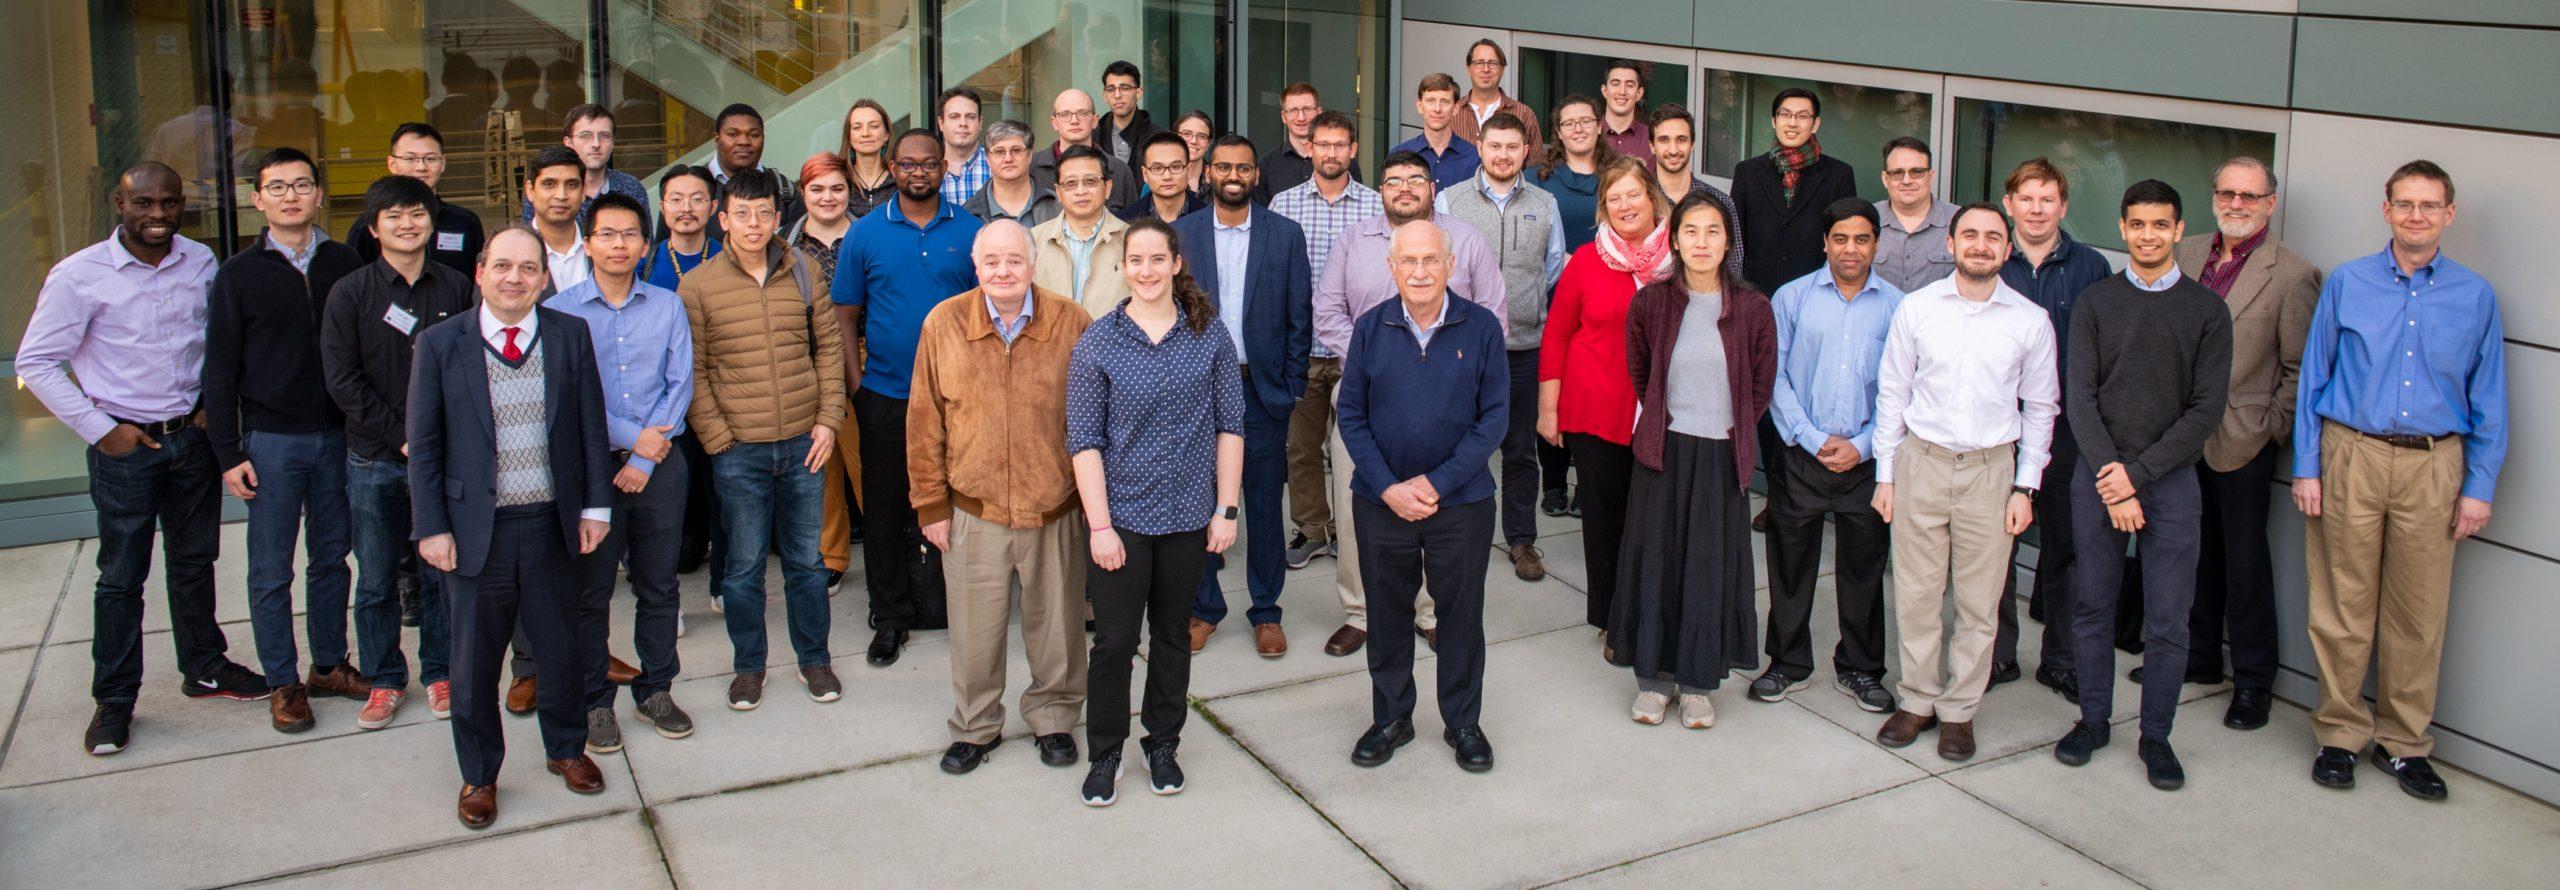 IDAES Project Team (Credit: Berkeley Lab)